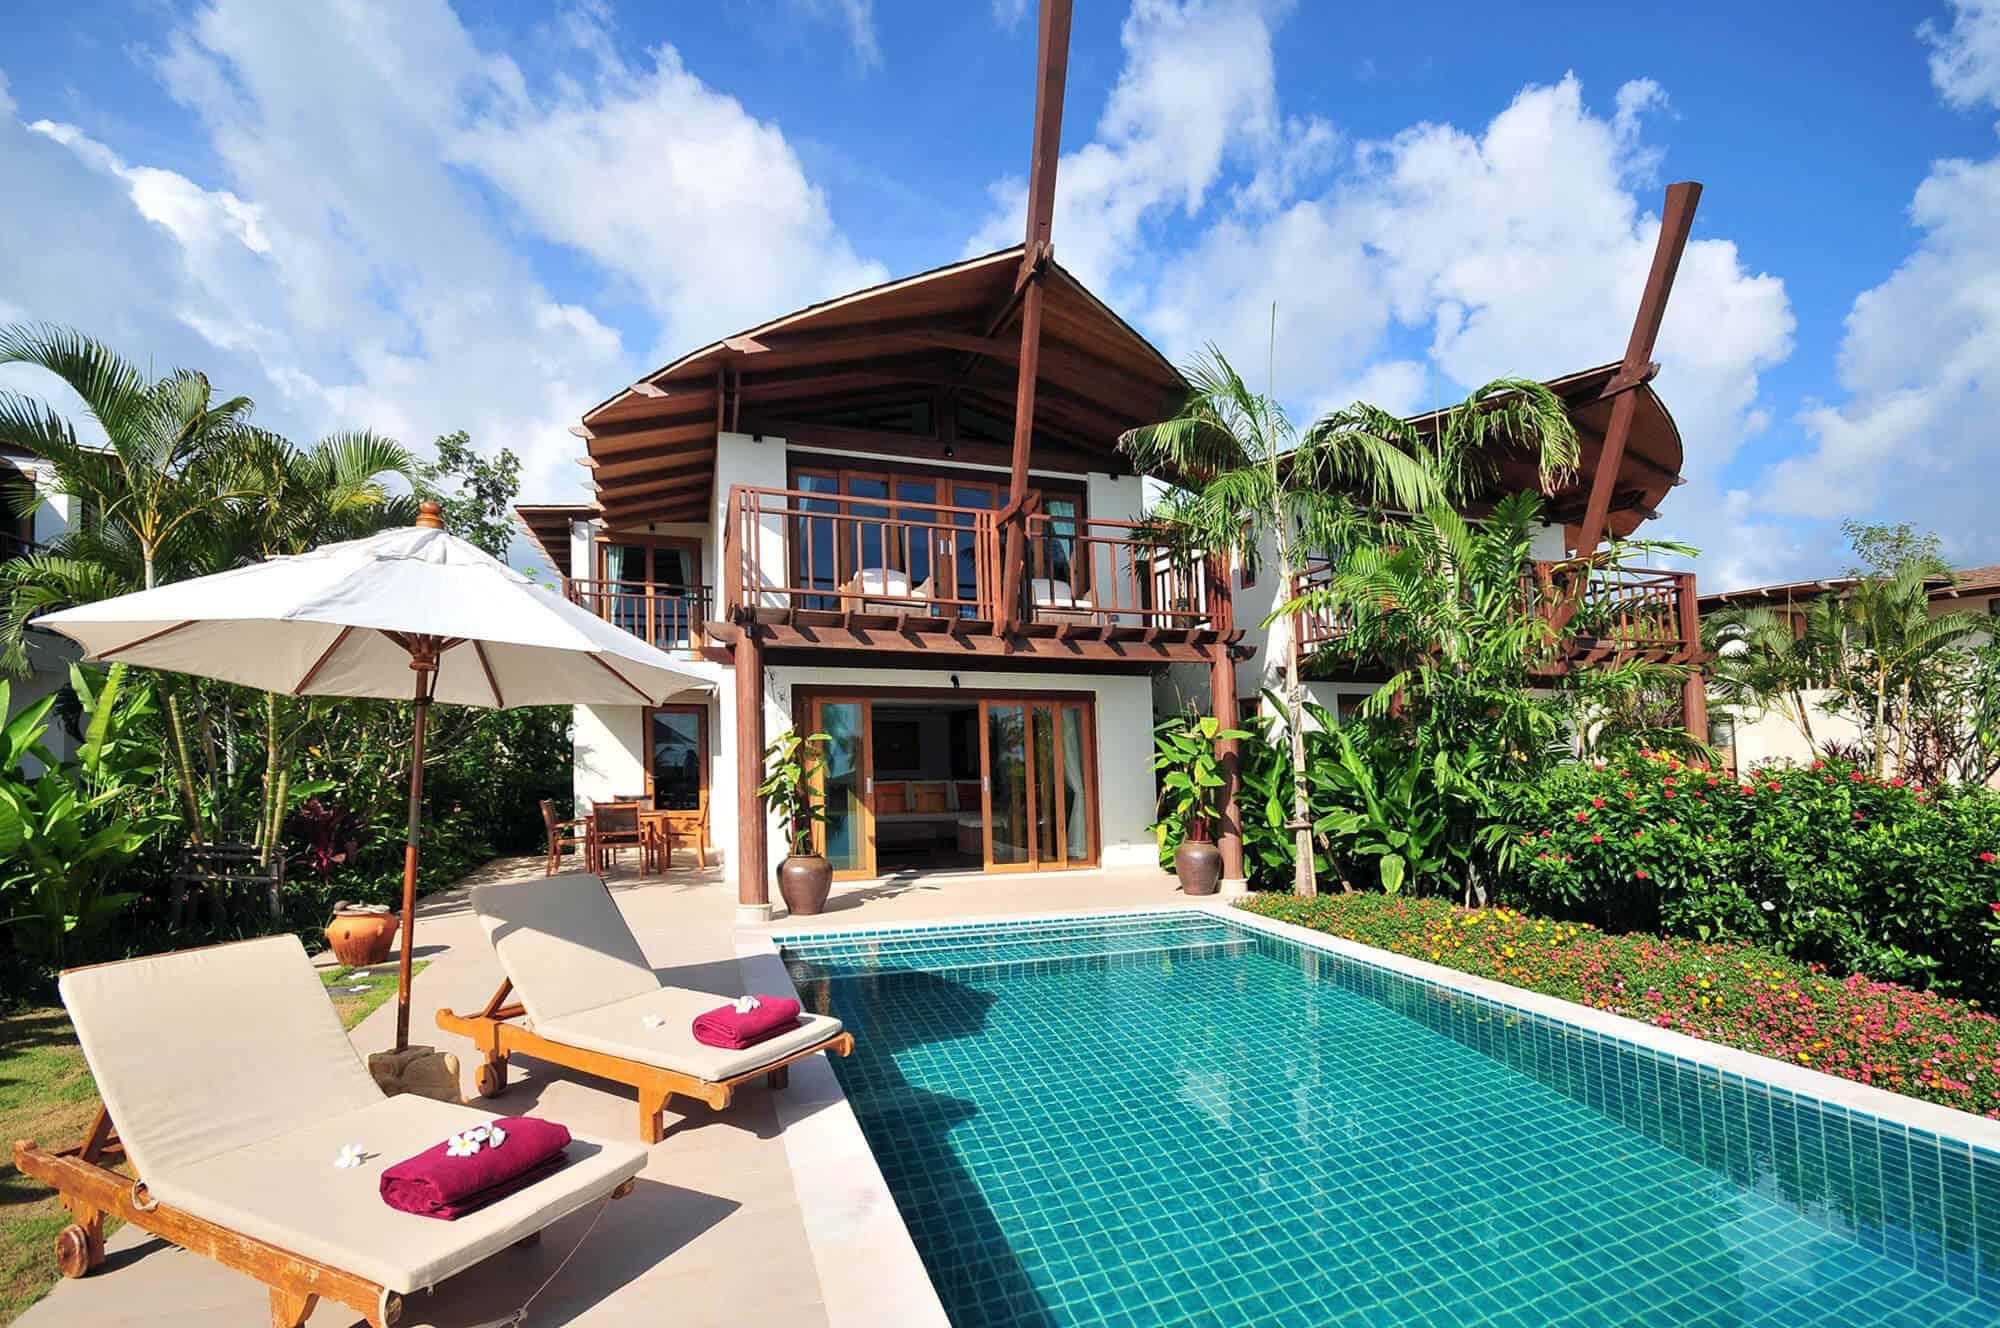 coconut-island-resort-phuket